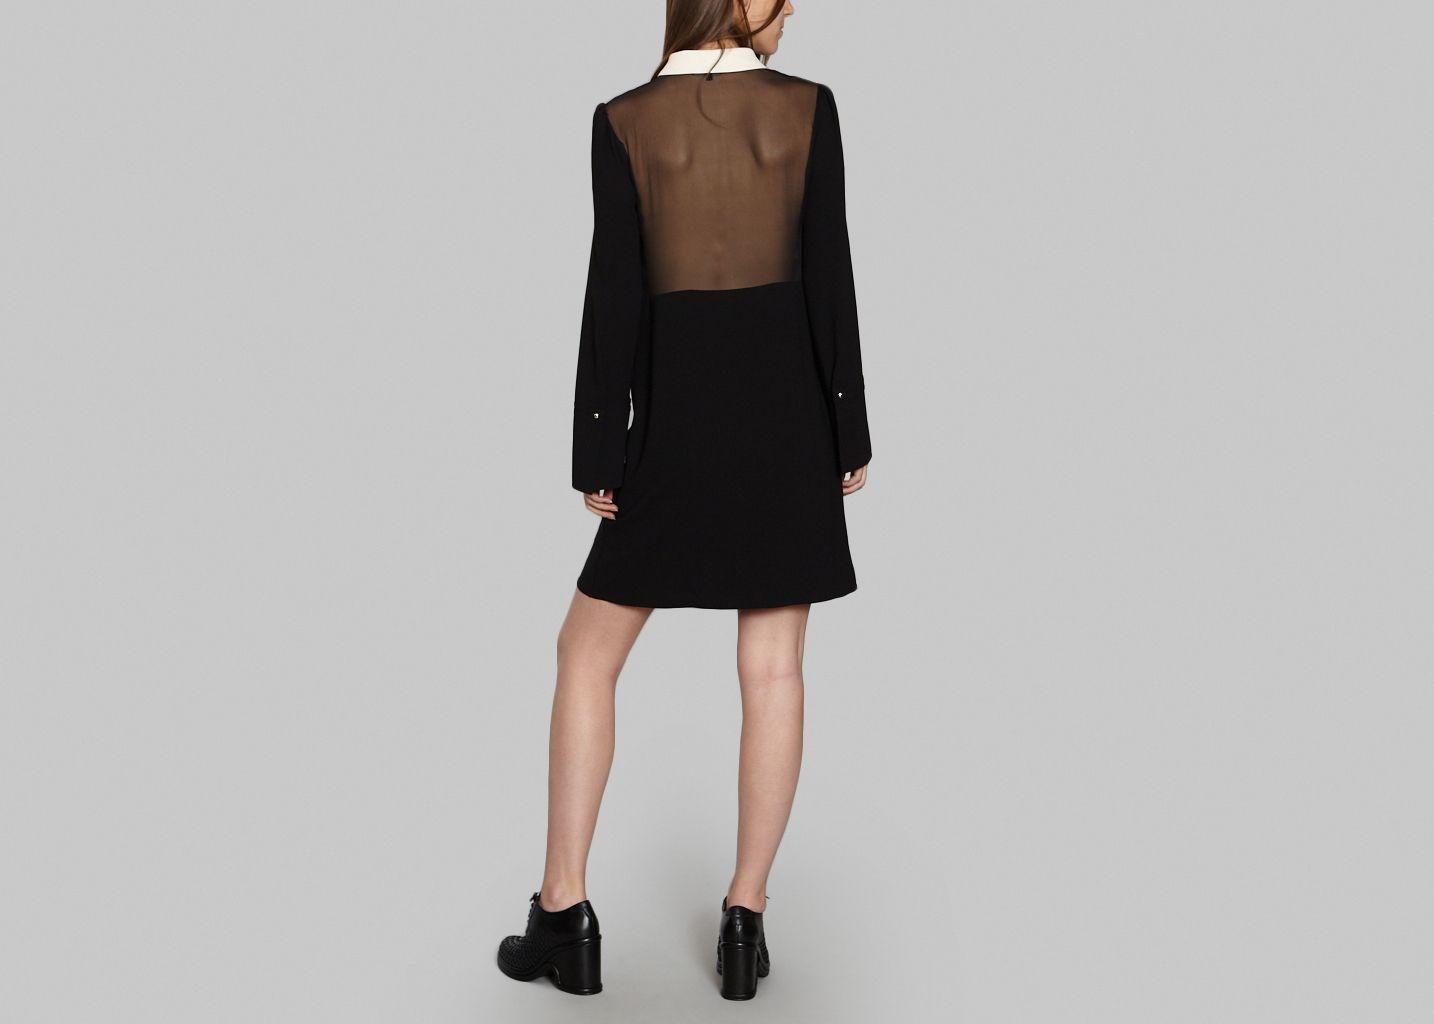 Robe Contrastante - Tara Jarmon